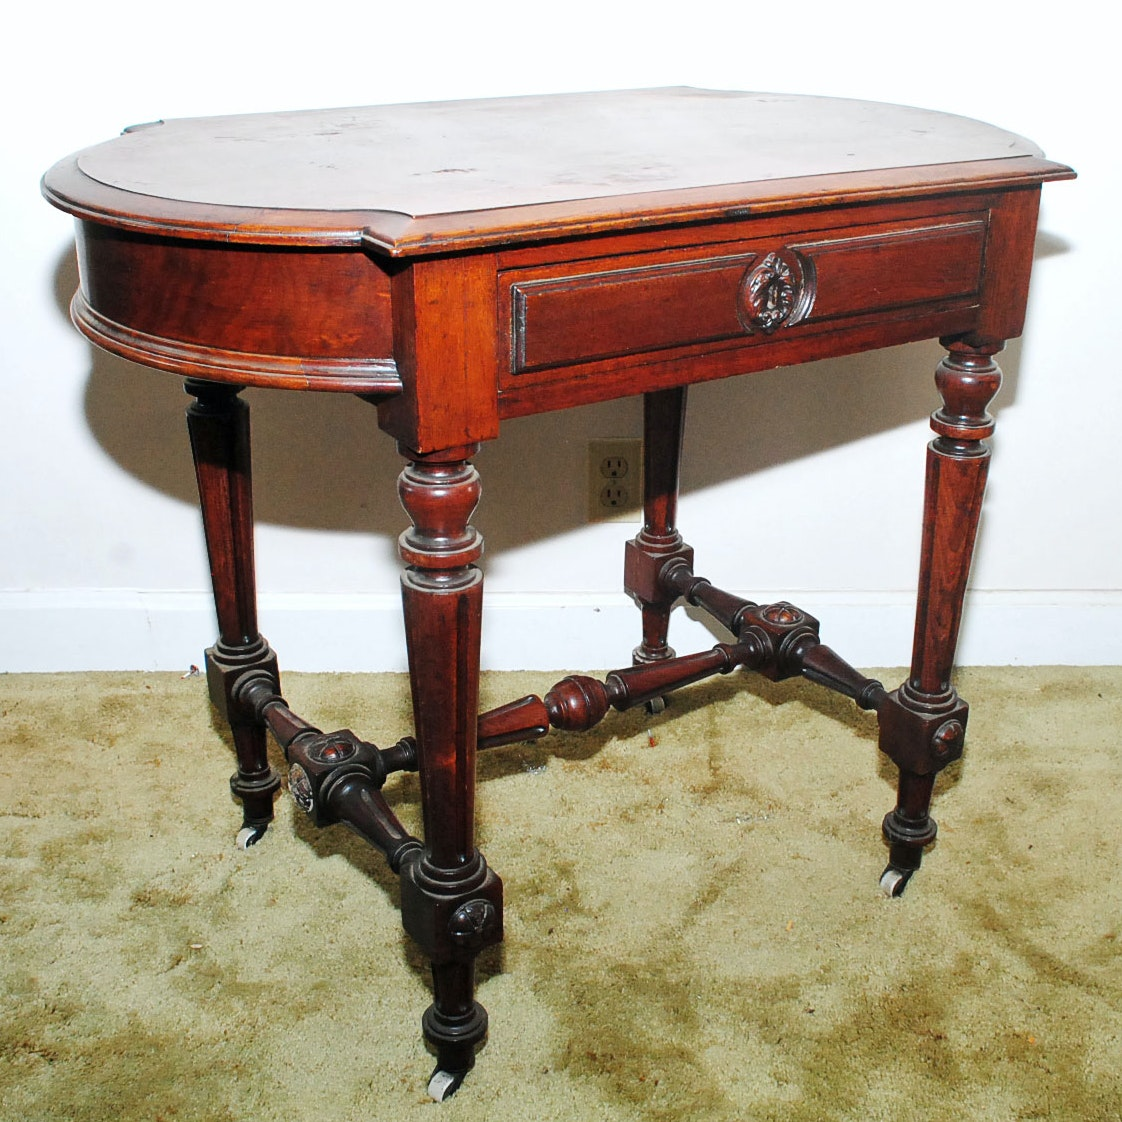 Antique American Renaissance Revival Writing Table